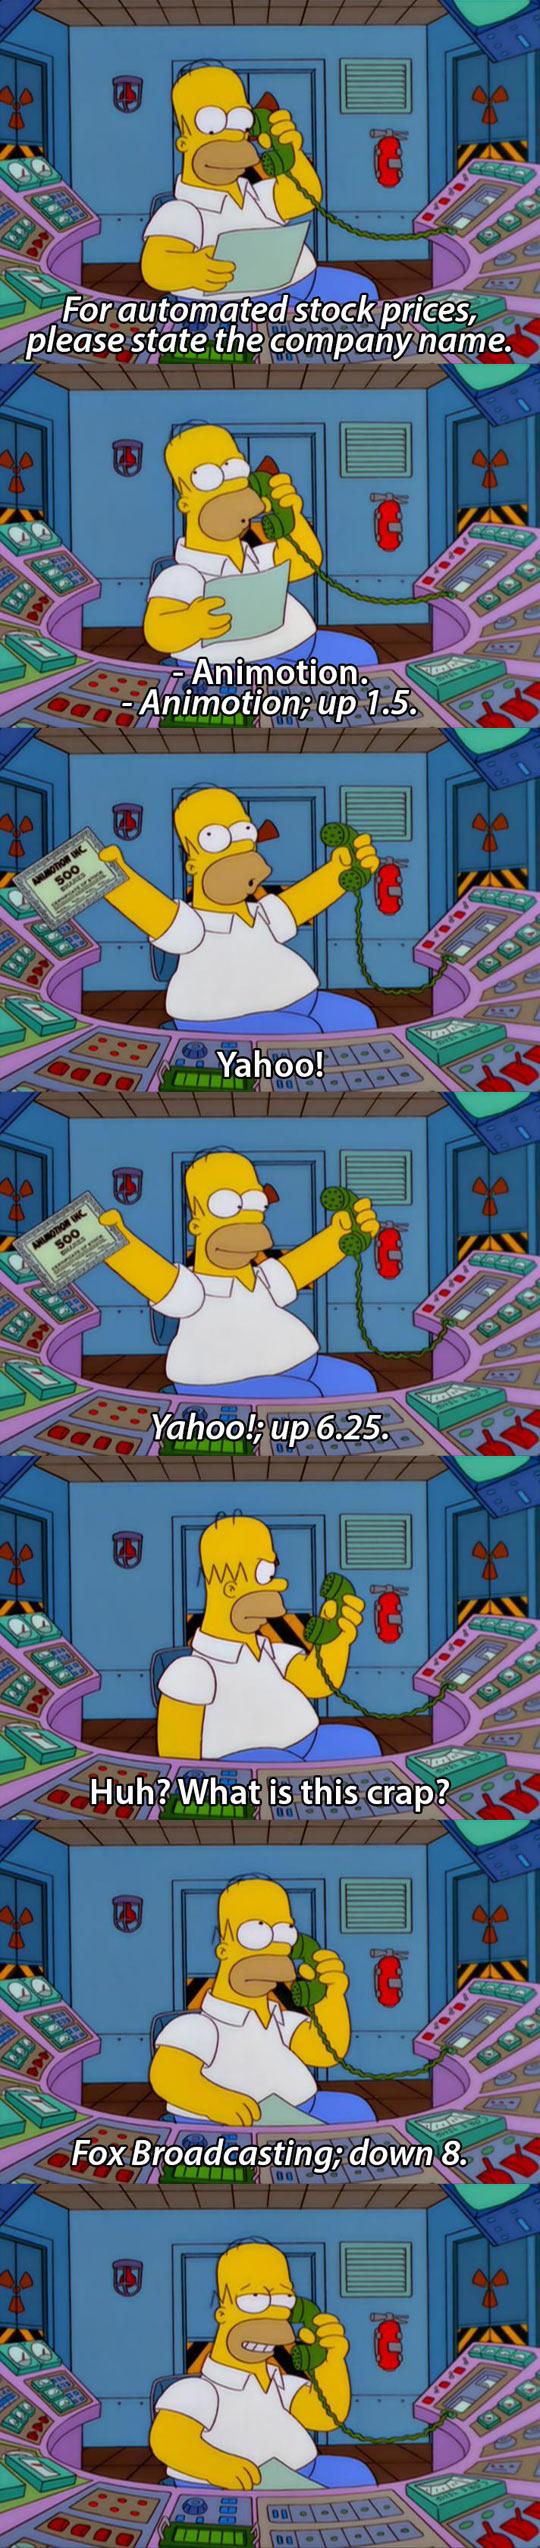 Homer Checks His Stocks